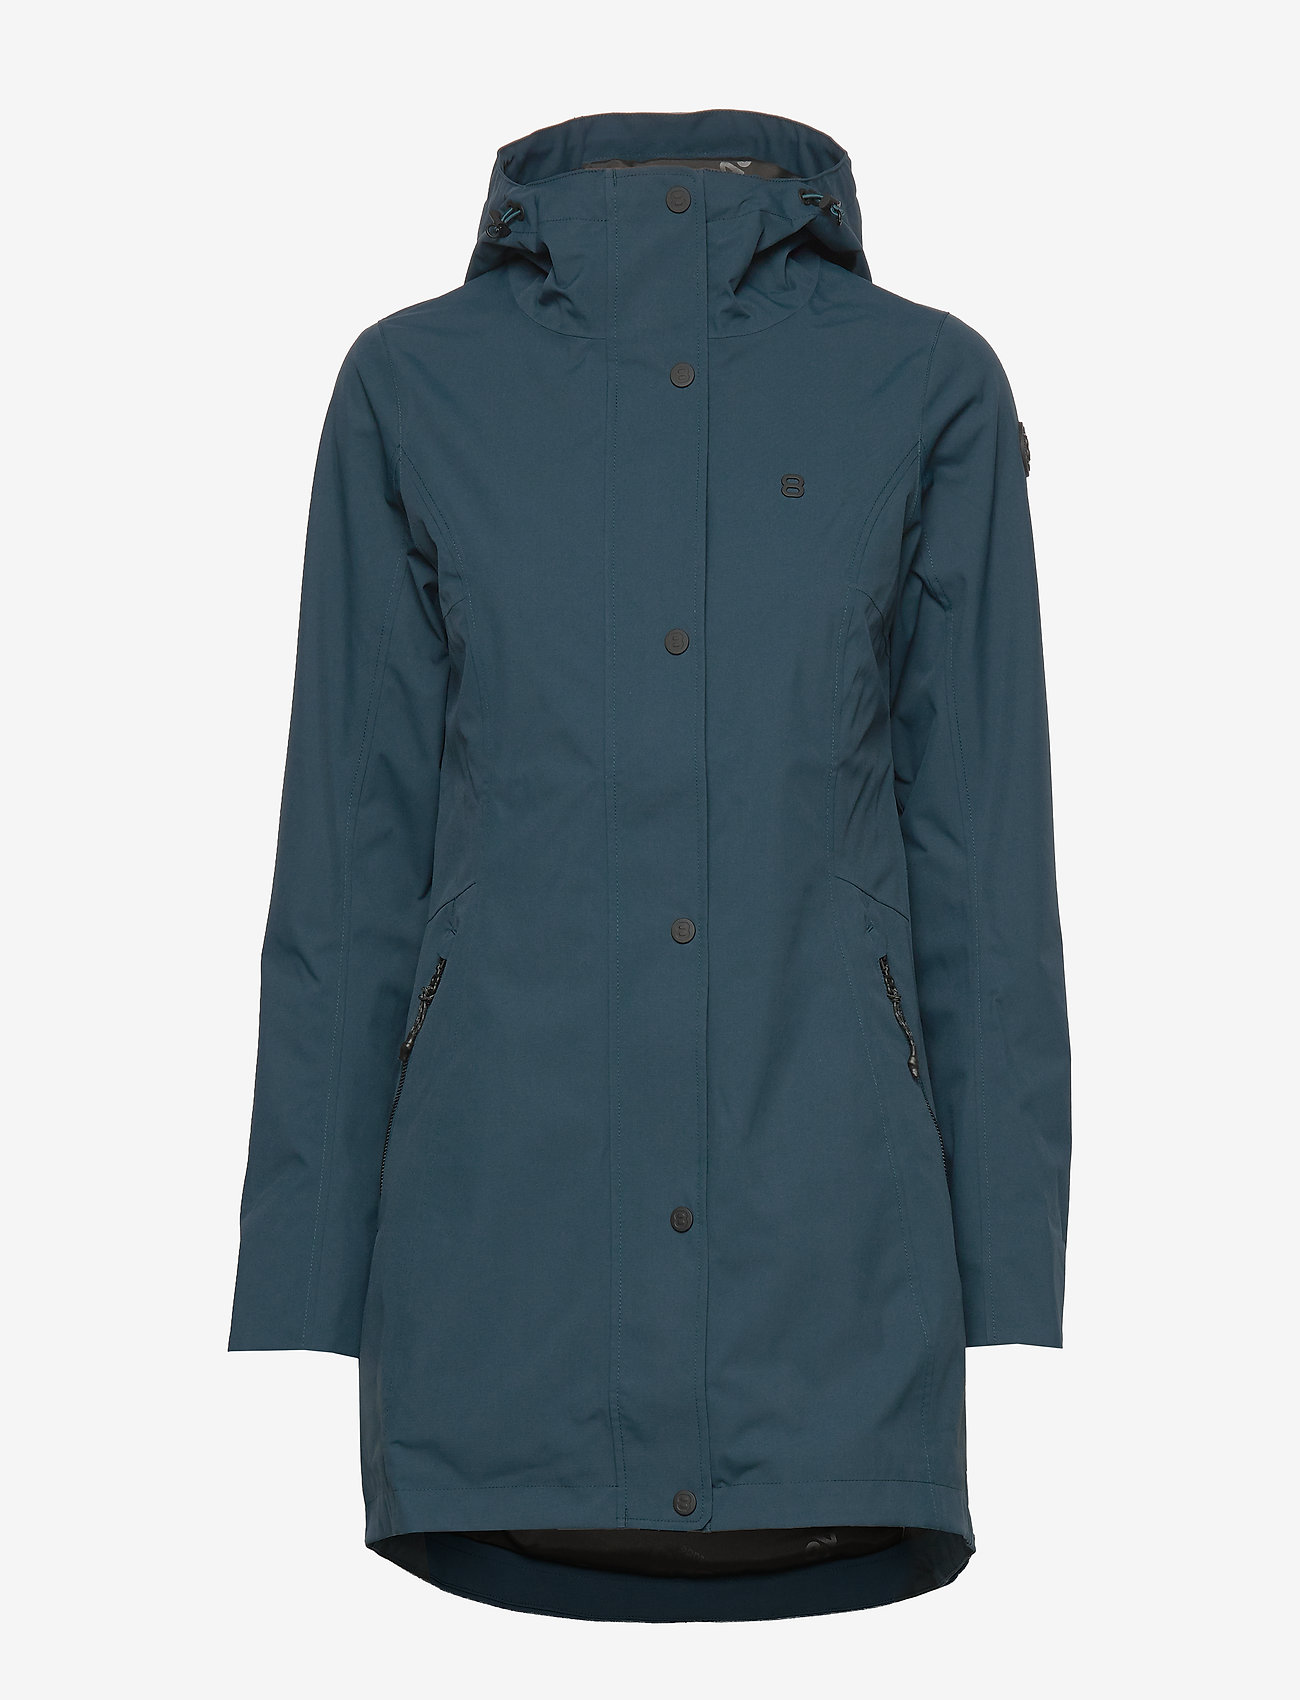 8848 Altitude - Scarlett W Jacket - outdoor & rain jackets - reflecting pond - 1